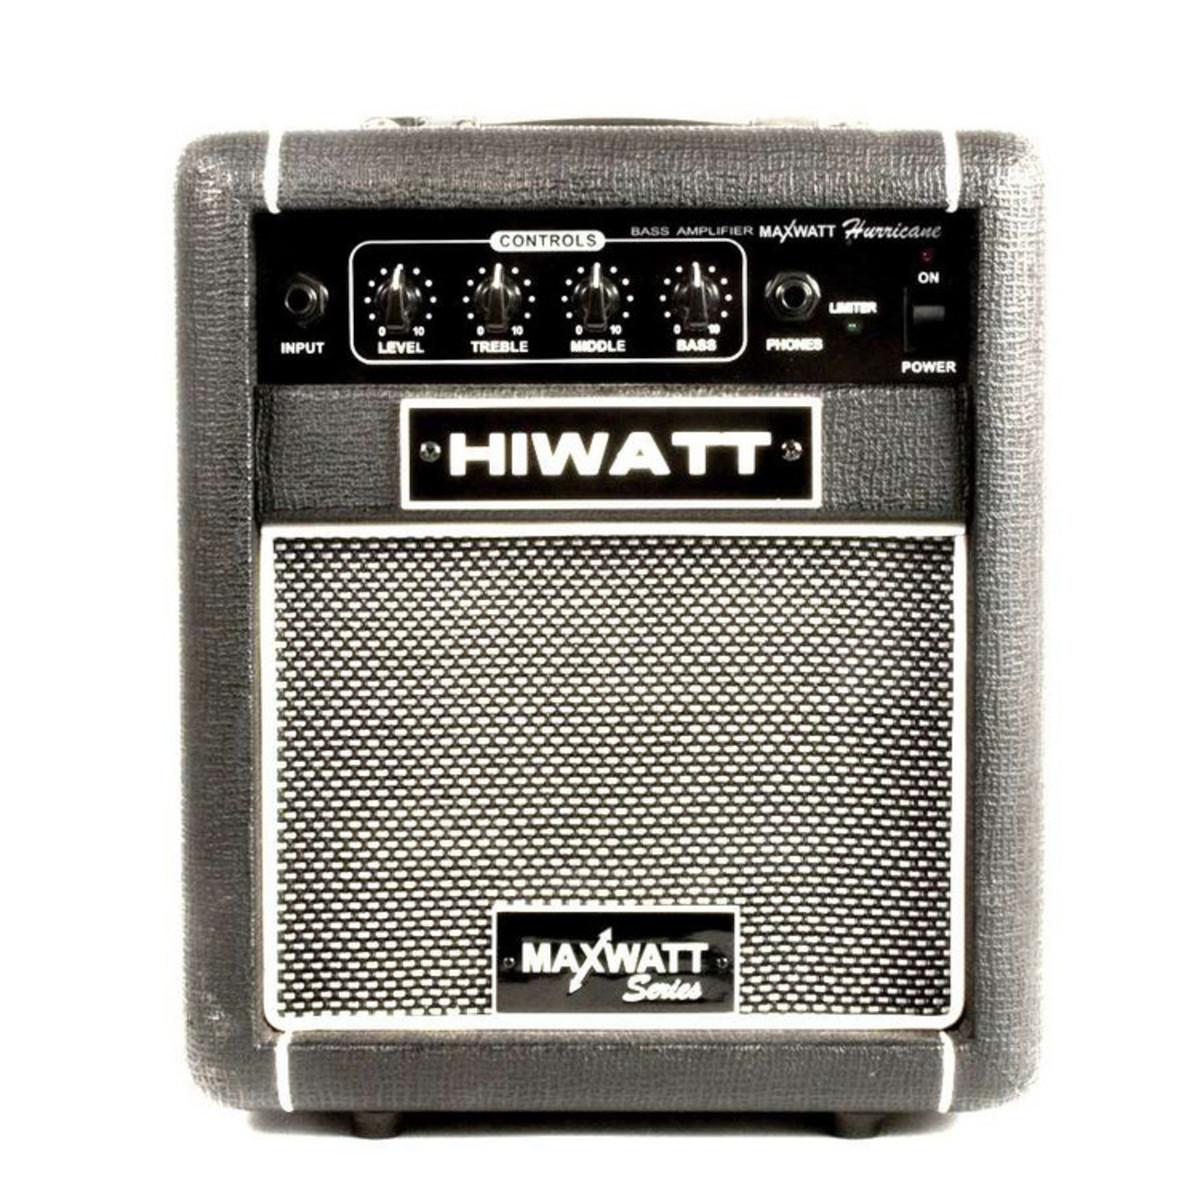 Amp logo hiwatt maxwatt series hurricane 10w bass practice amplifier